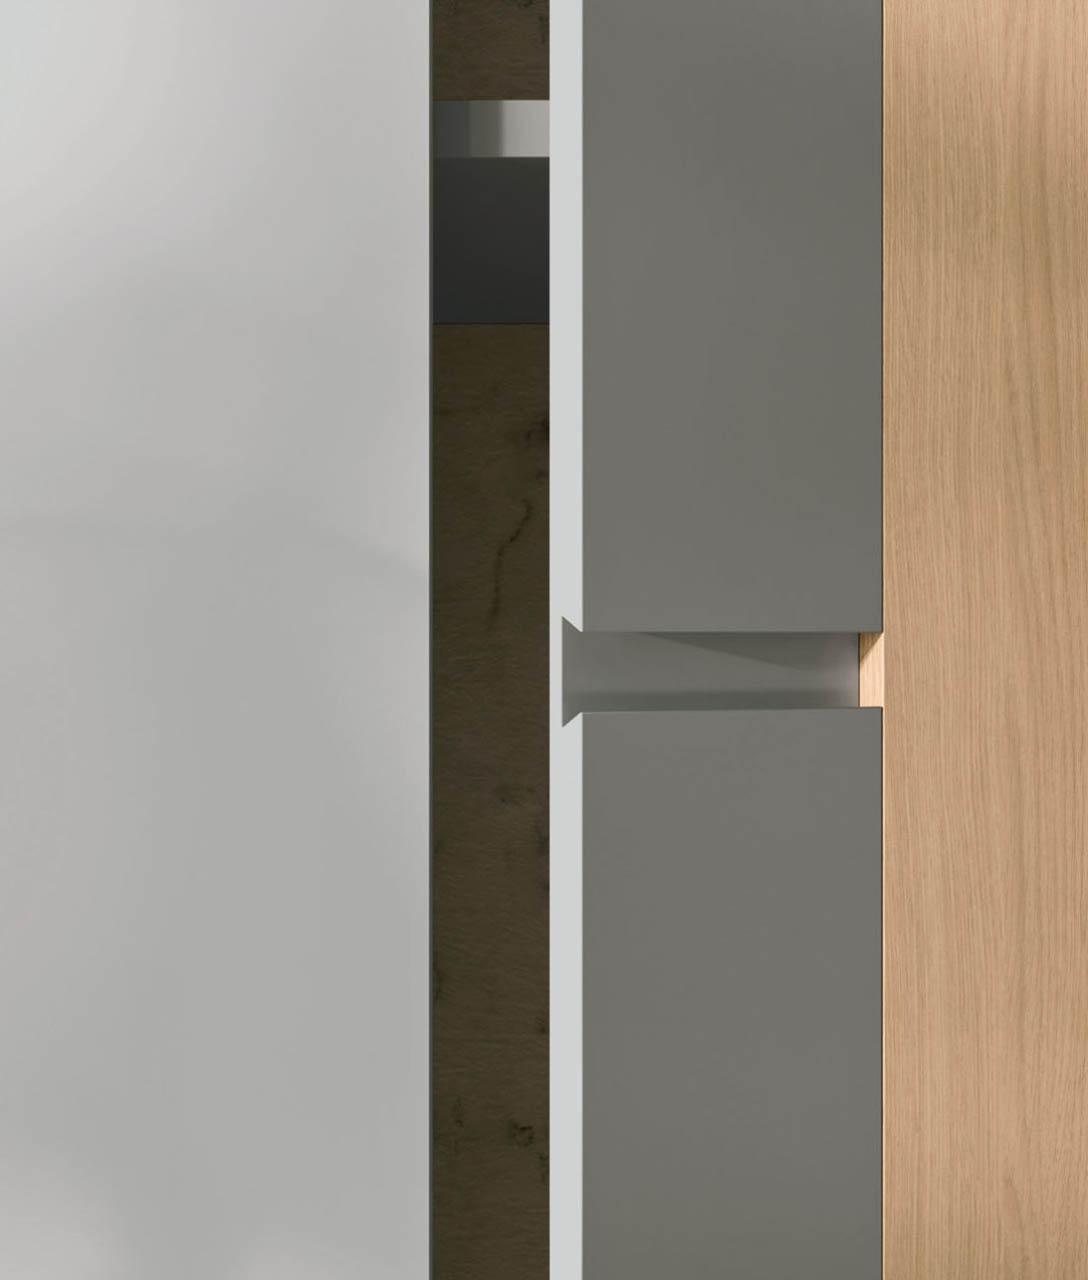 armadio-battente-anta-tela-2-orme-1100x1294